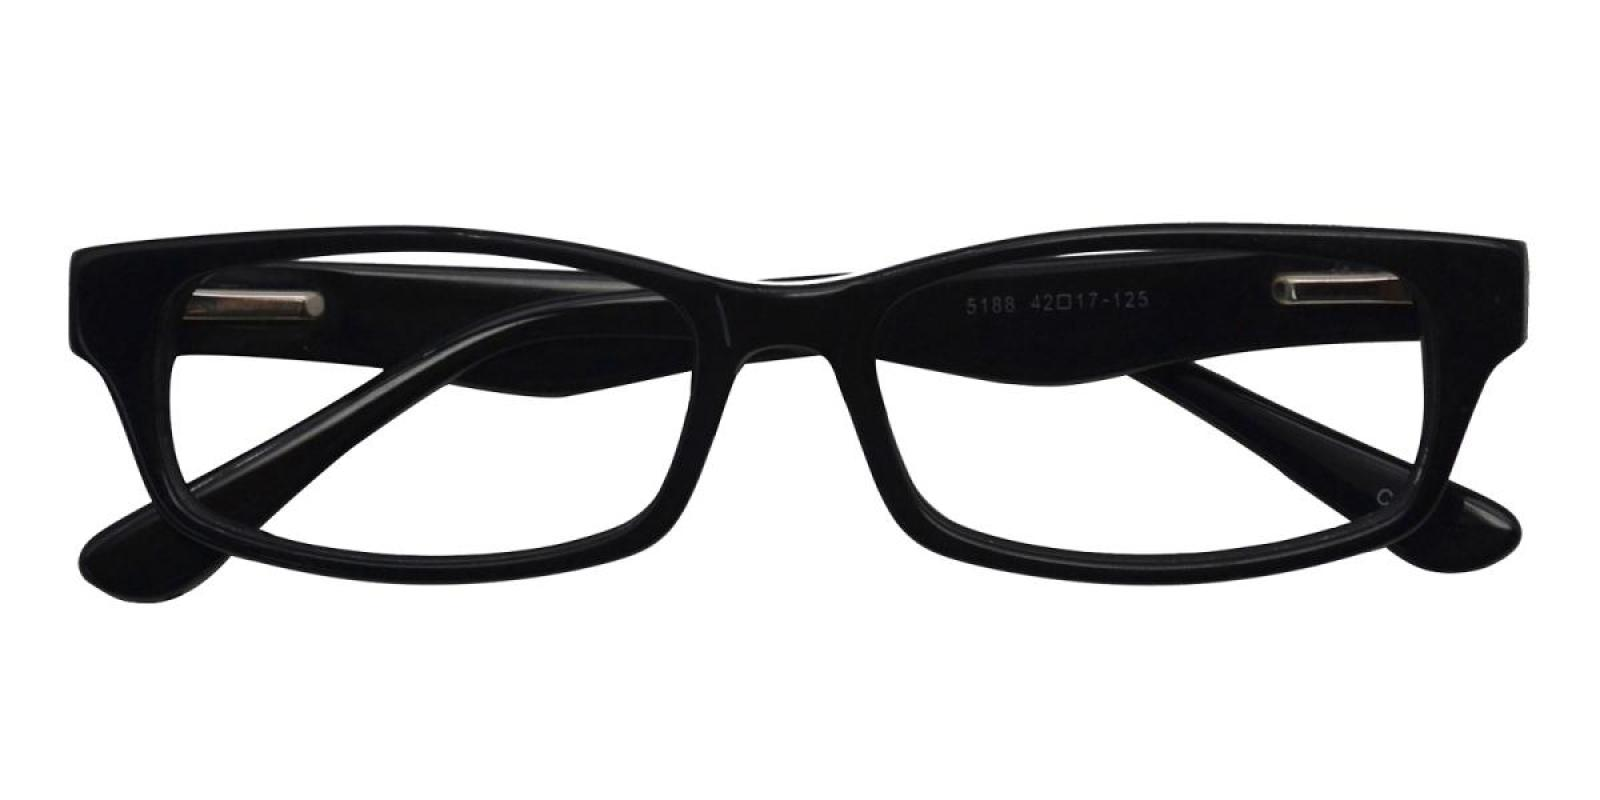 -Black-Rectangle-Acetate-Eyeglasses-detail